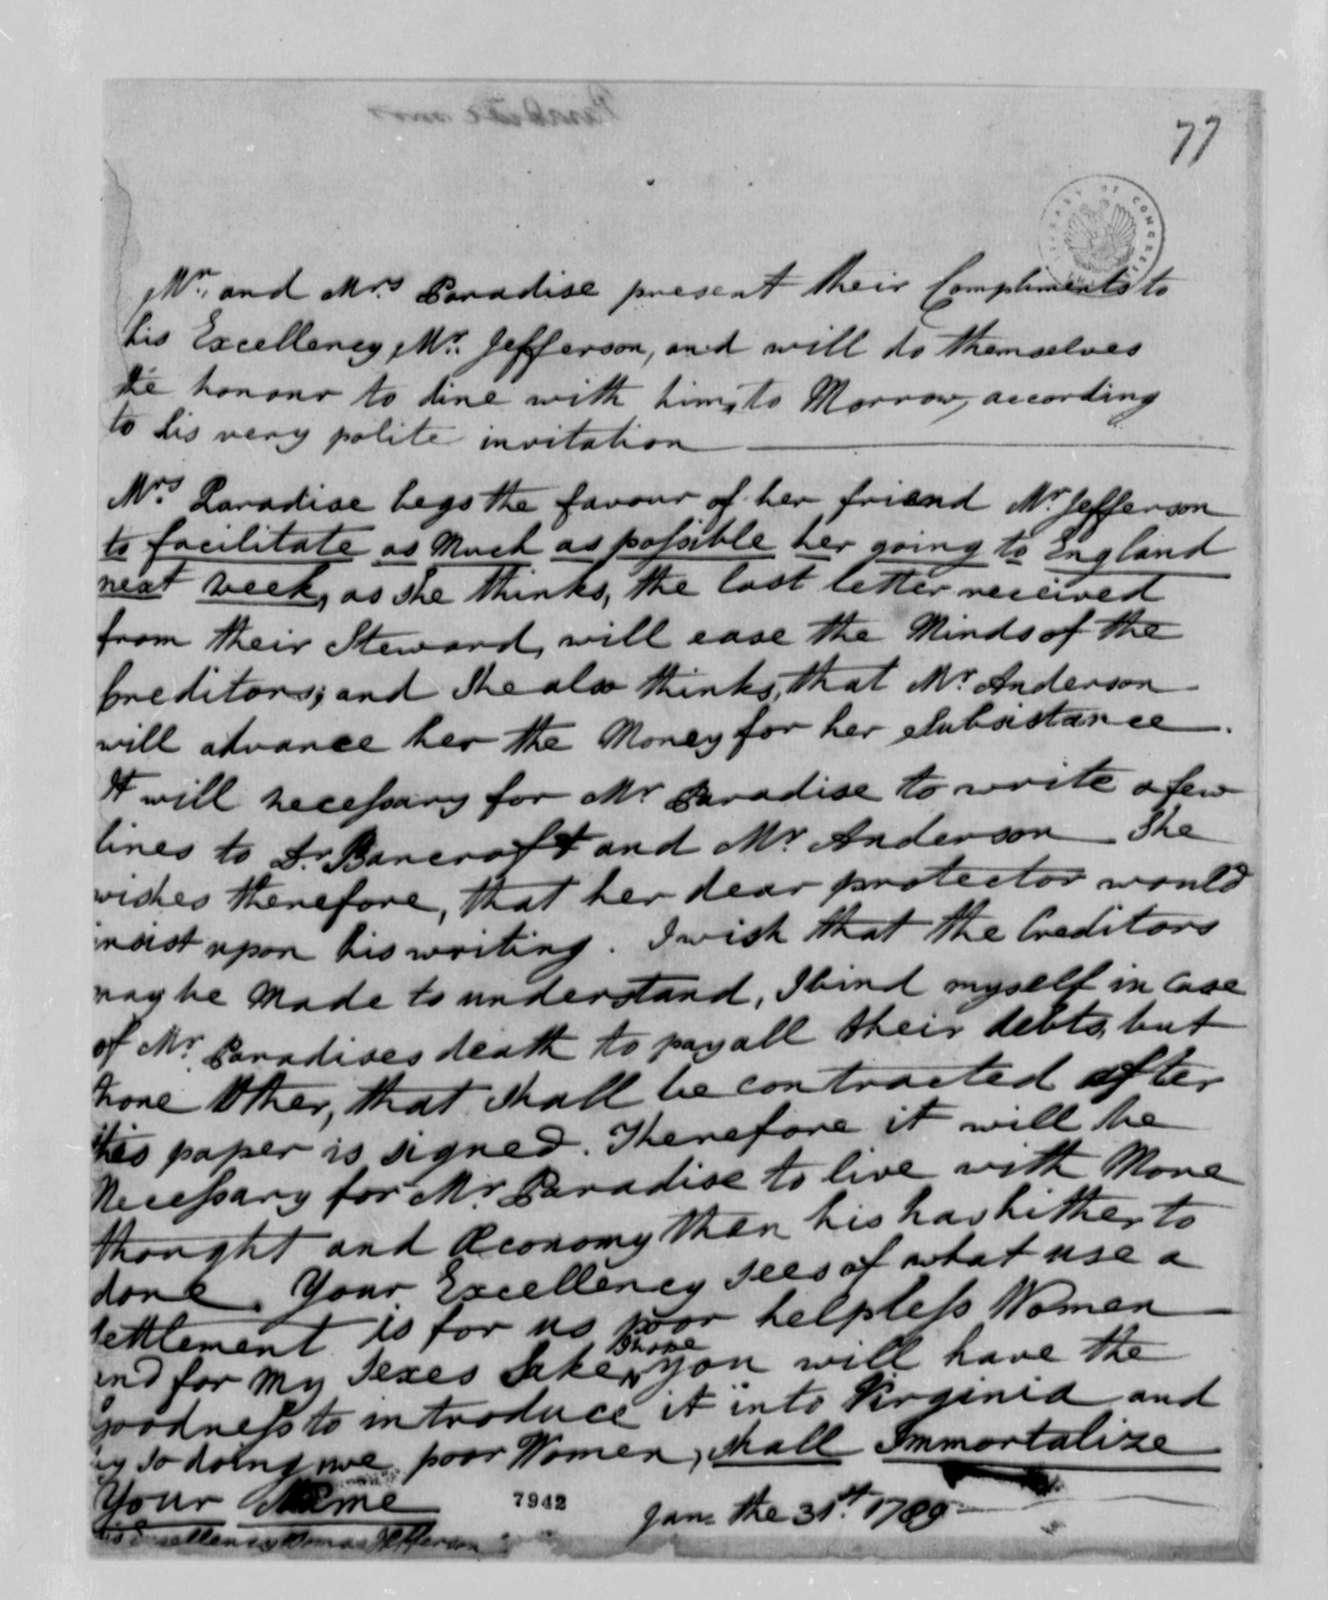 Lucy Ludwell Paradise to Thomas Jefferson, January 29, 1789